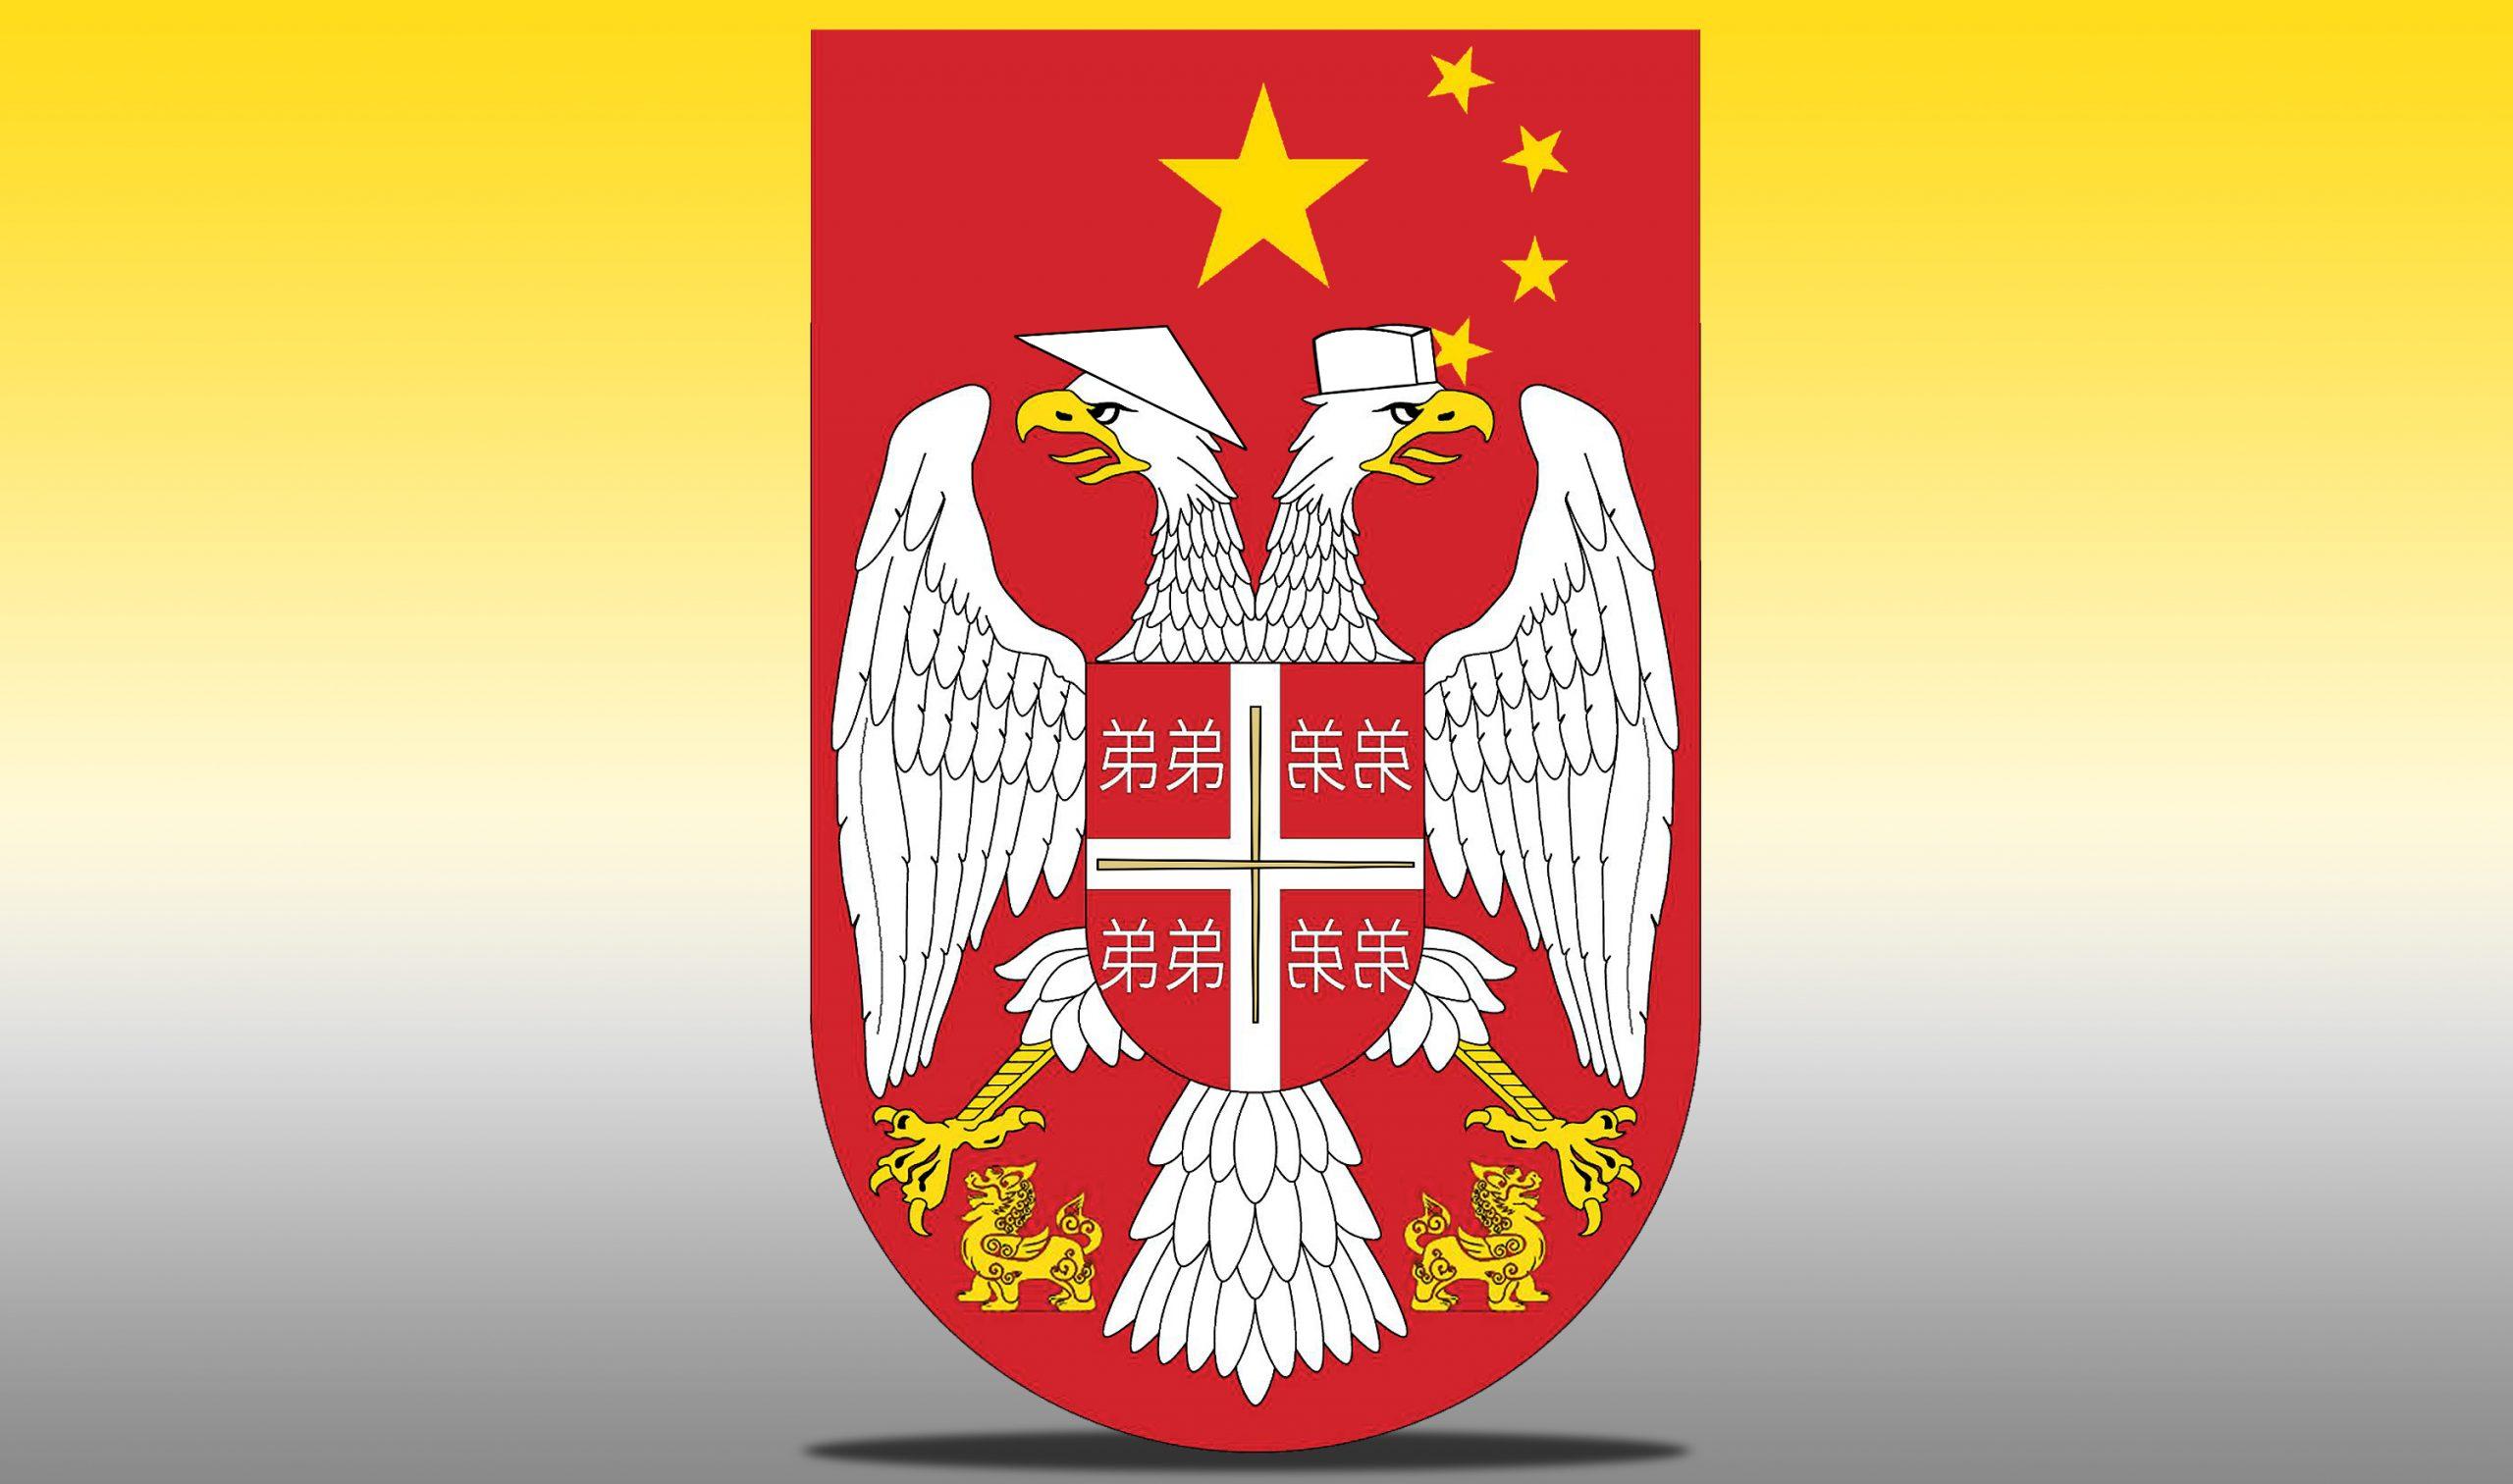 Stav Srba prema Kini